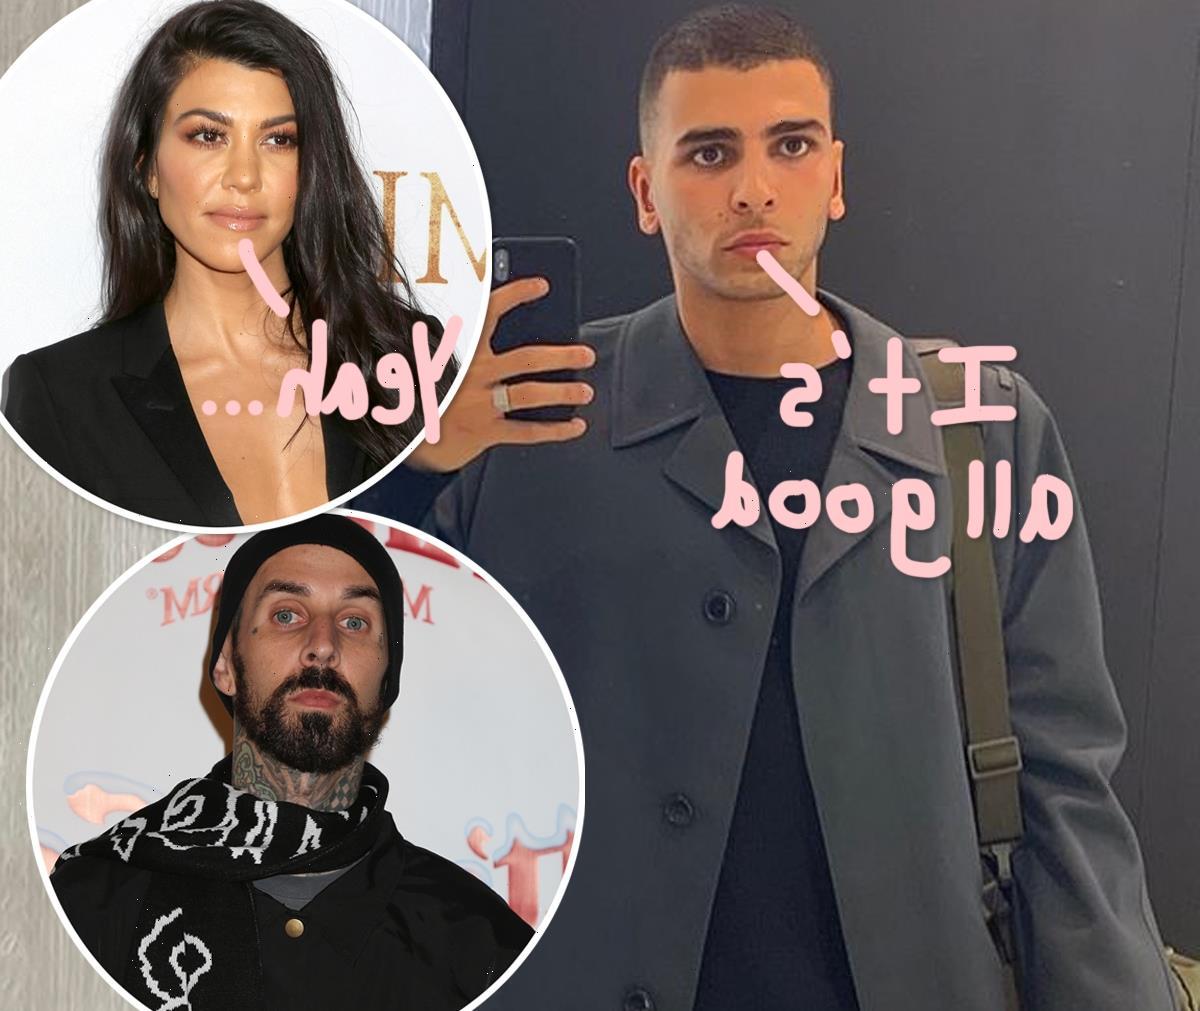 Younes Bendjima Denies Shading Kourtney Kardashian & Travis Barker: 'Keep Me Far Away From All That'